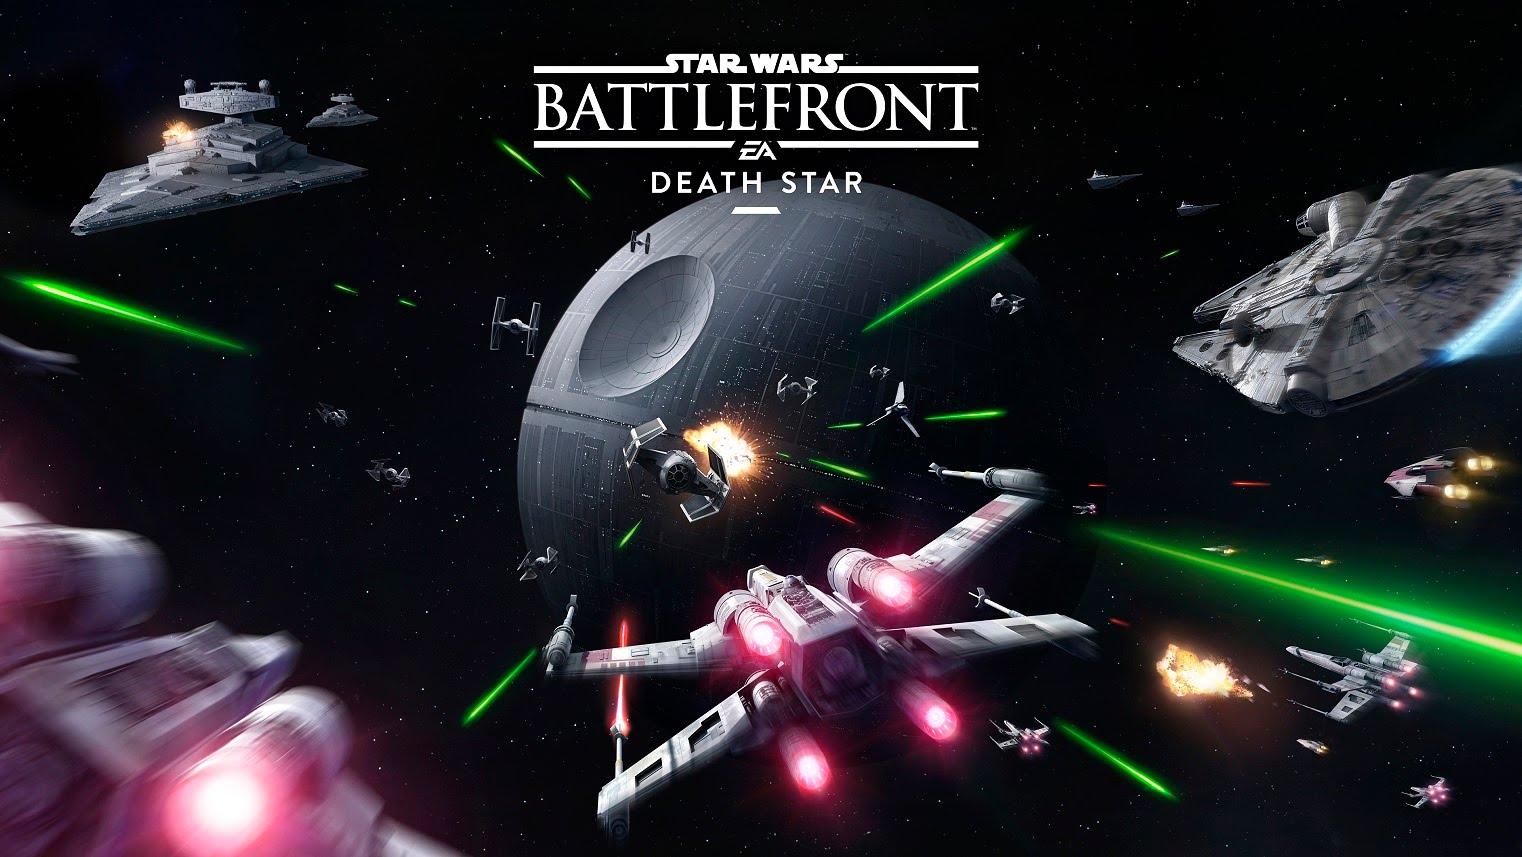 yavin 4 star wars battlefront 2